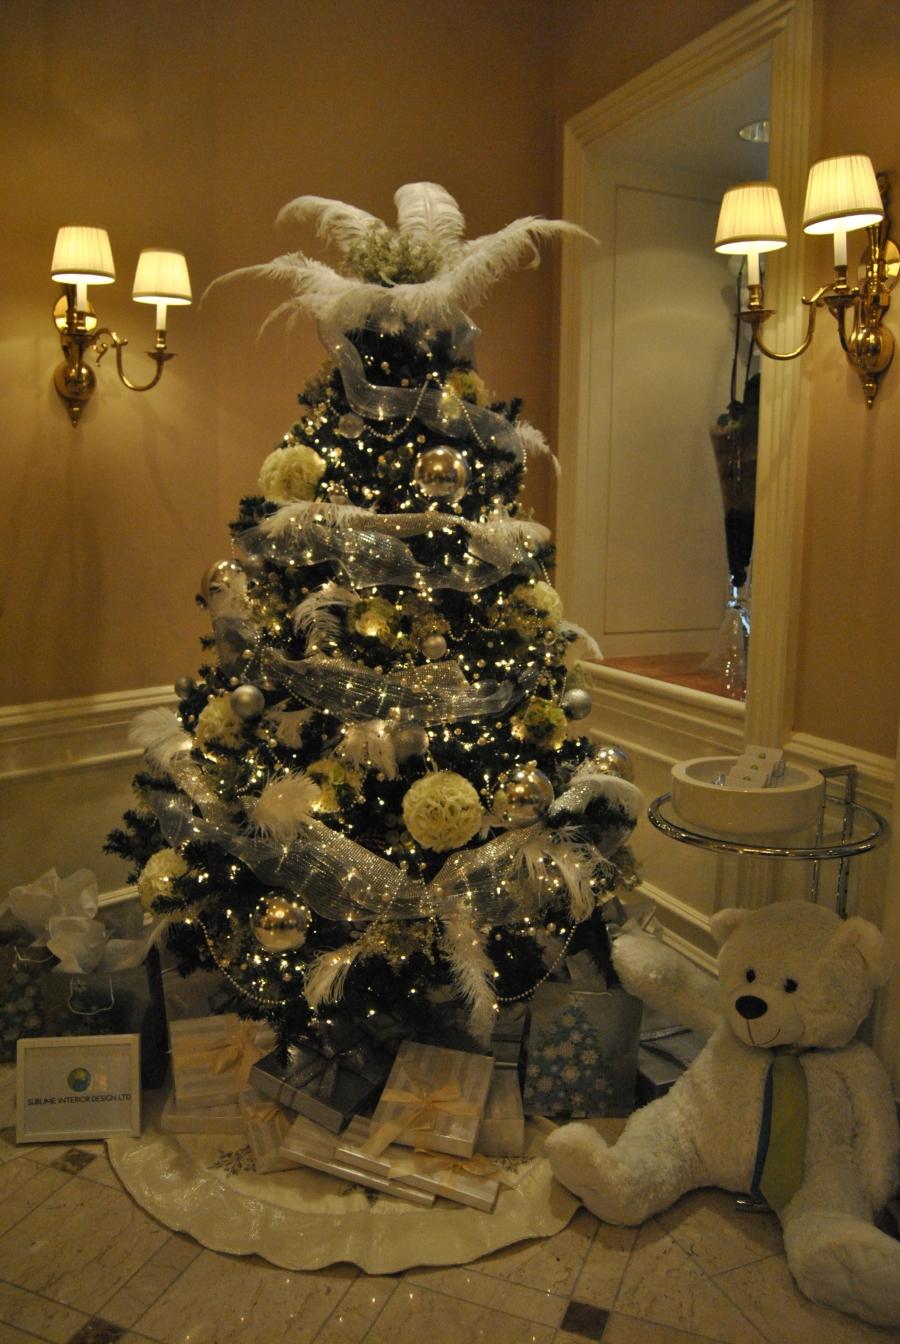 45 Classy Christmas Tree Decorations Ideas Decoration Love